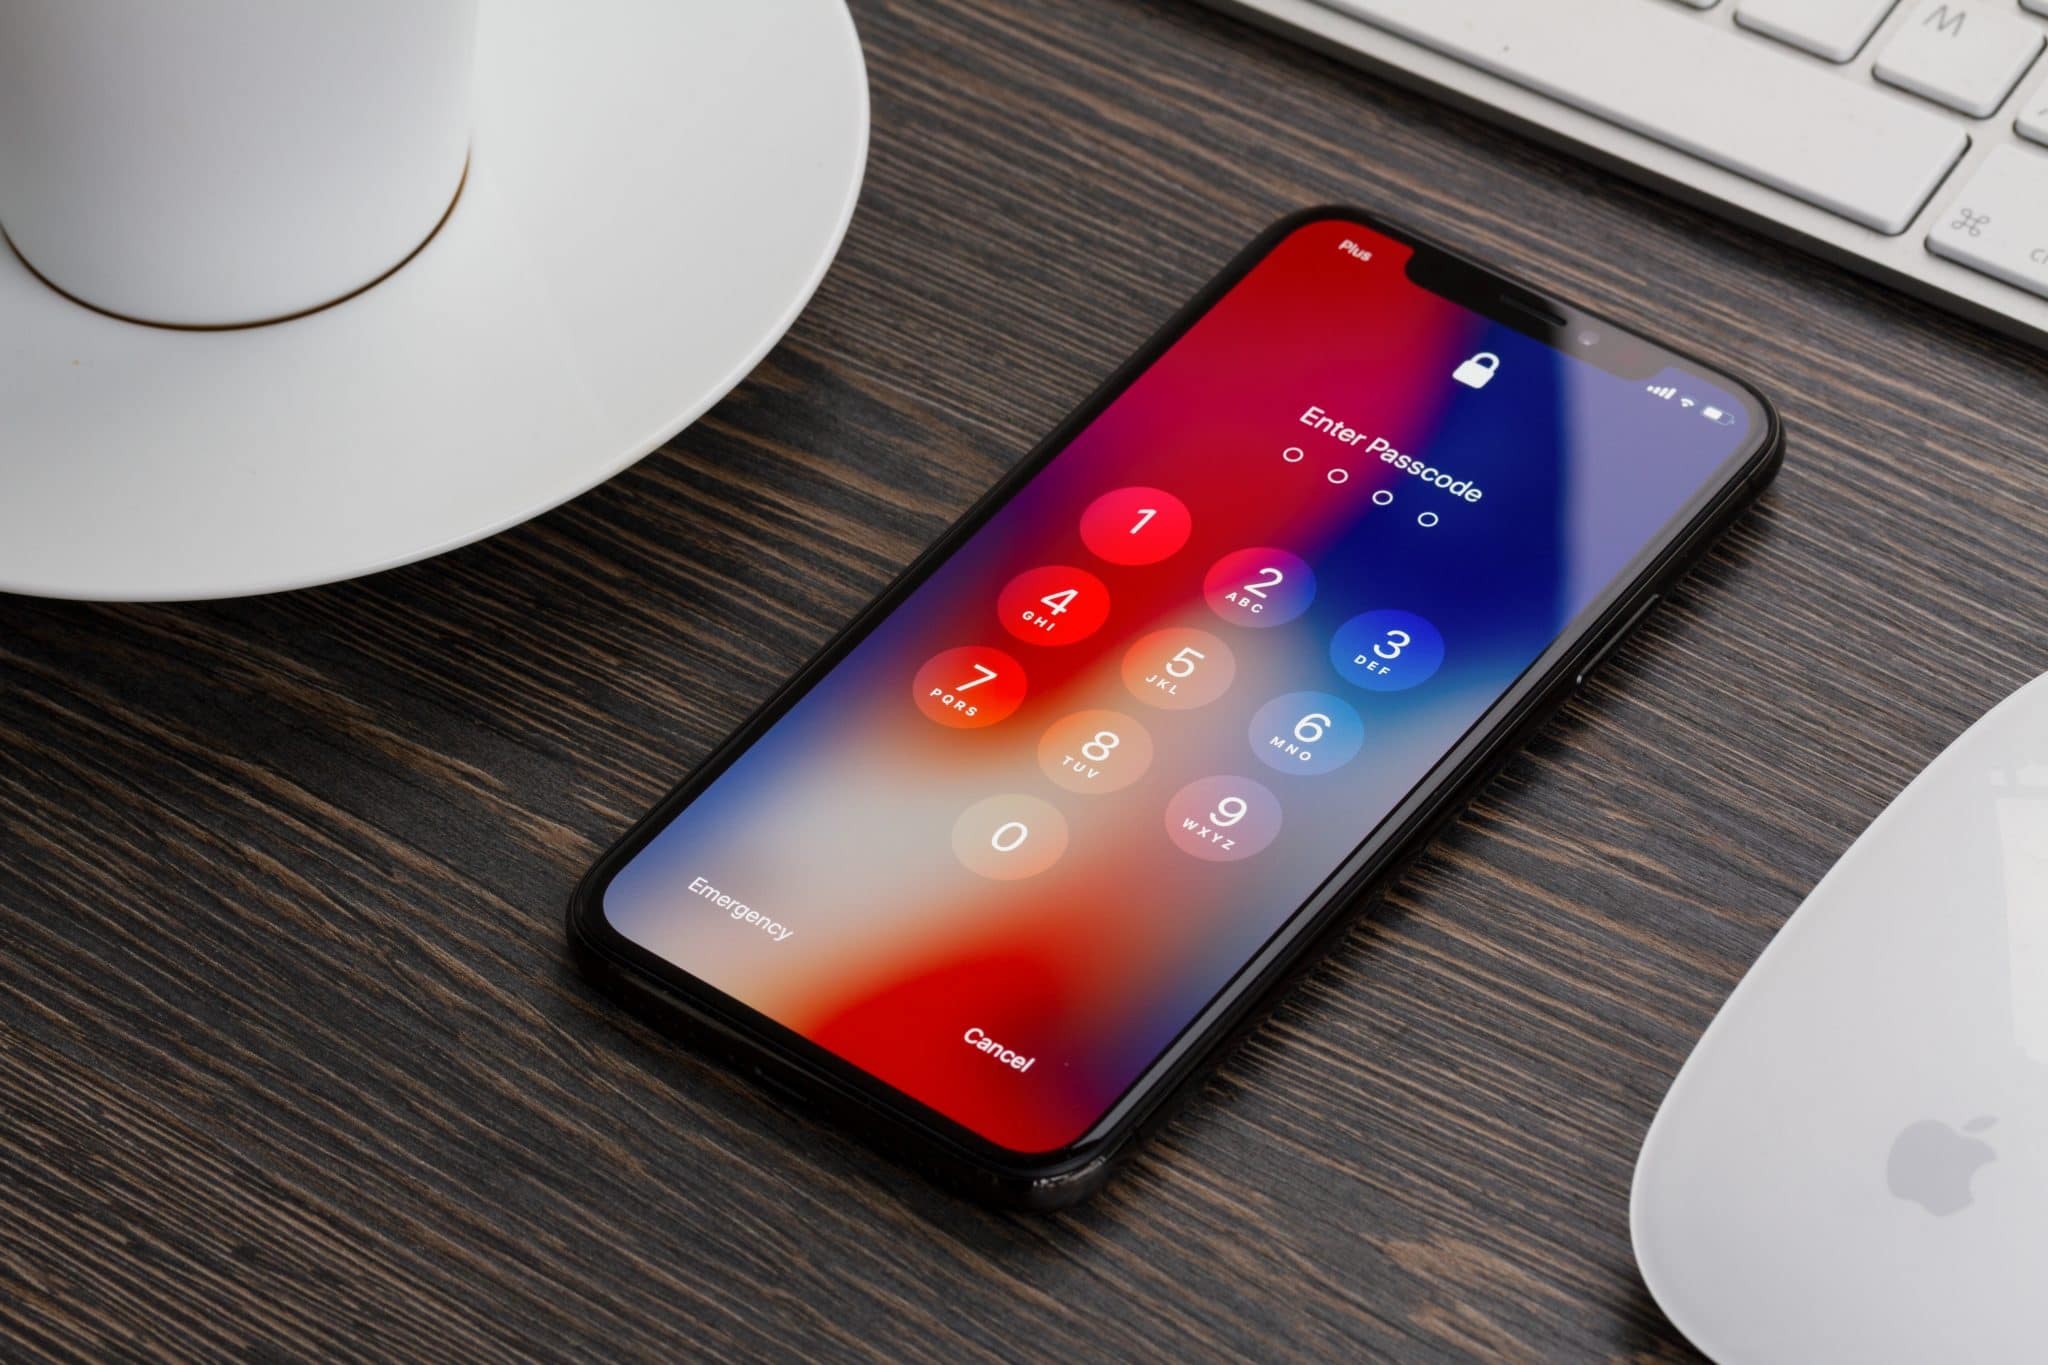 Neues Iphone Update